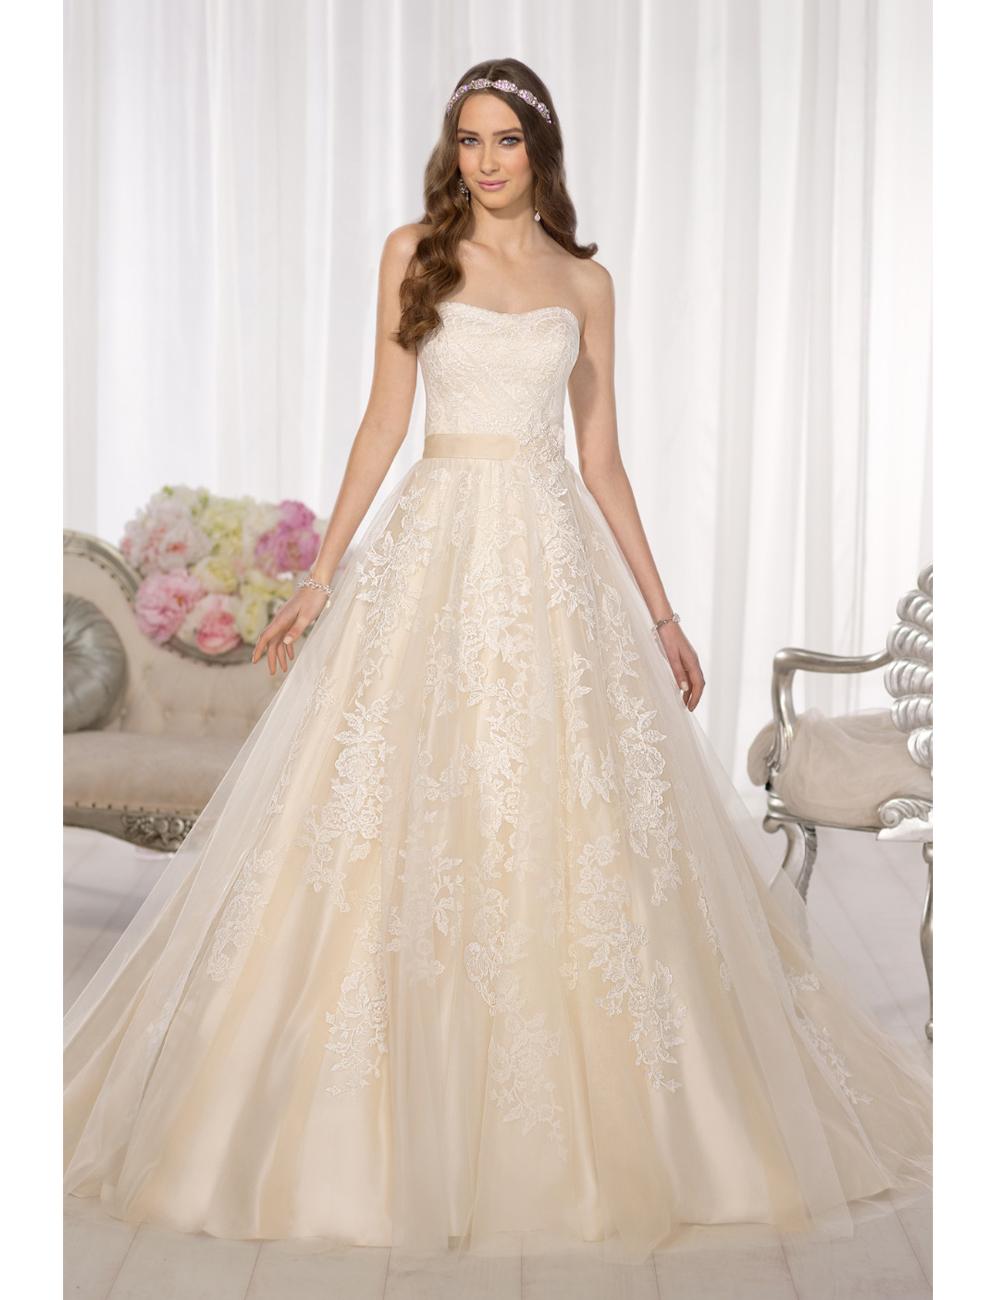 Magical Wedding Dresses